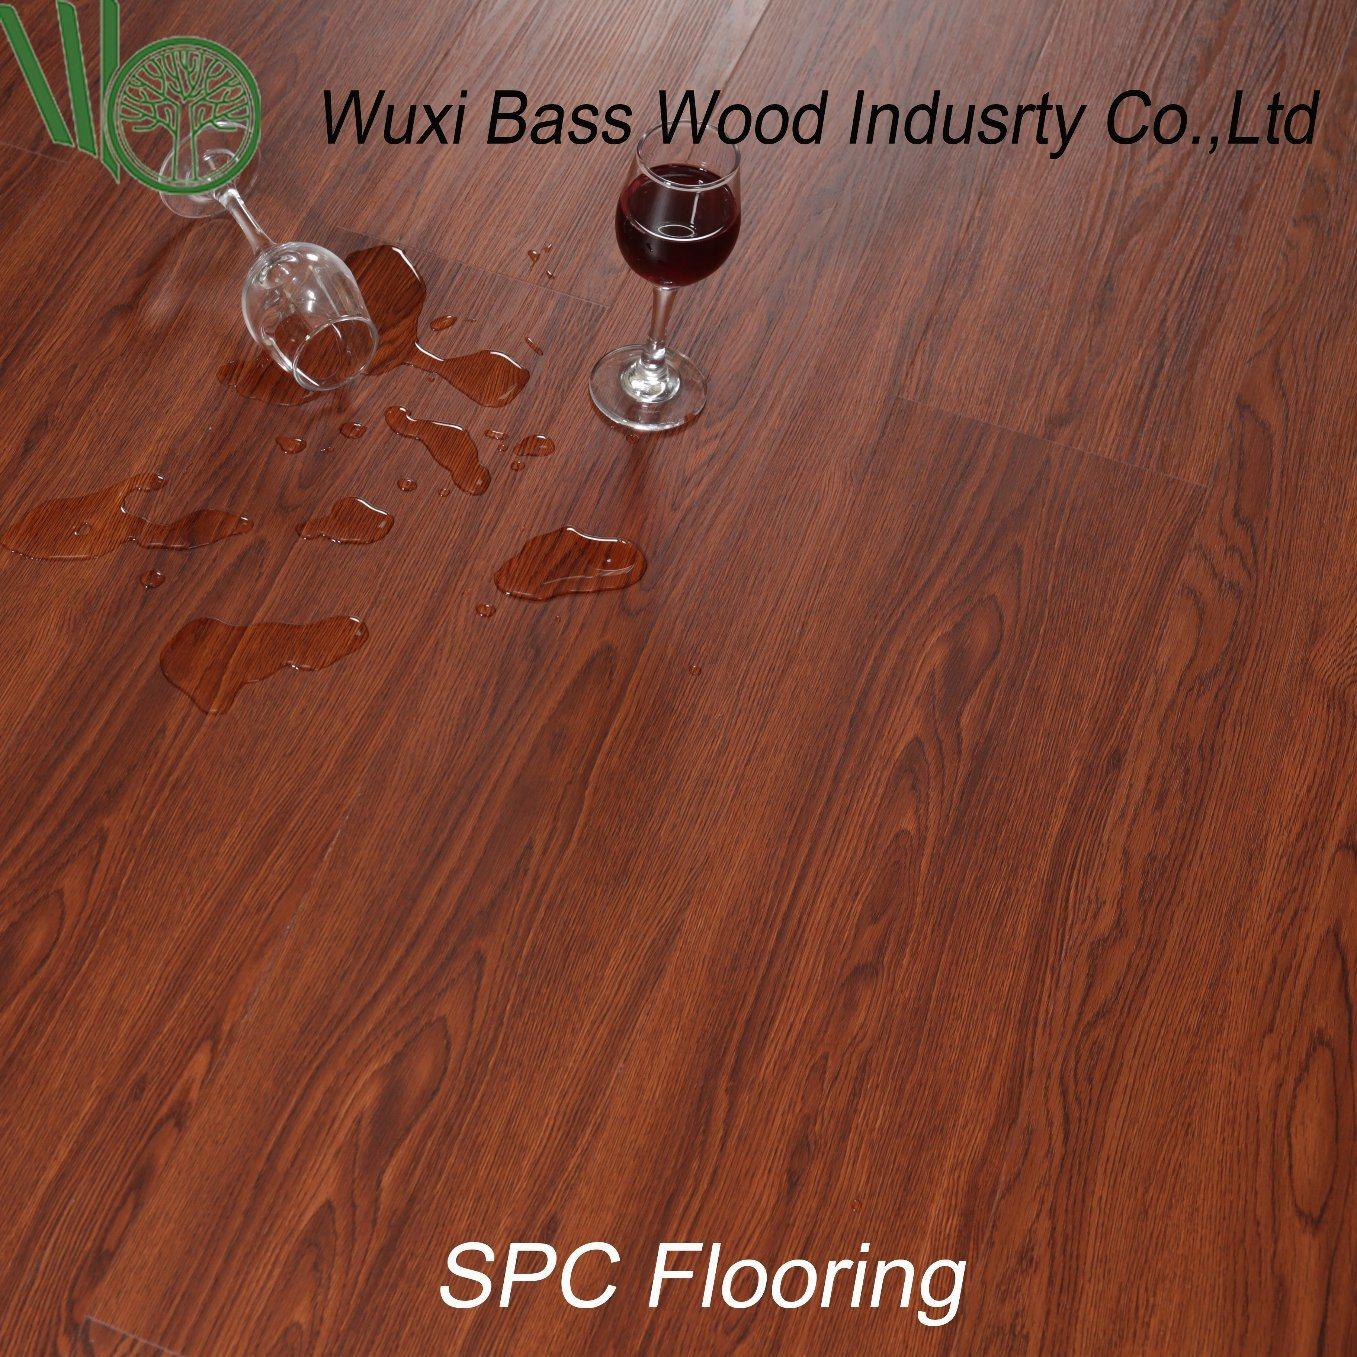 Locking Joint System Spc Flooring Formaldehyde Free